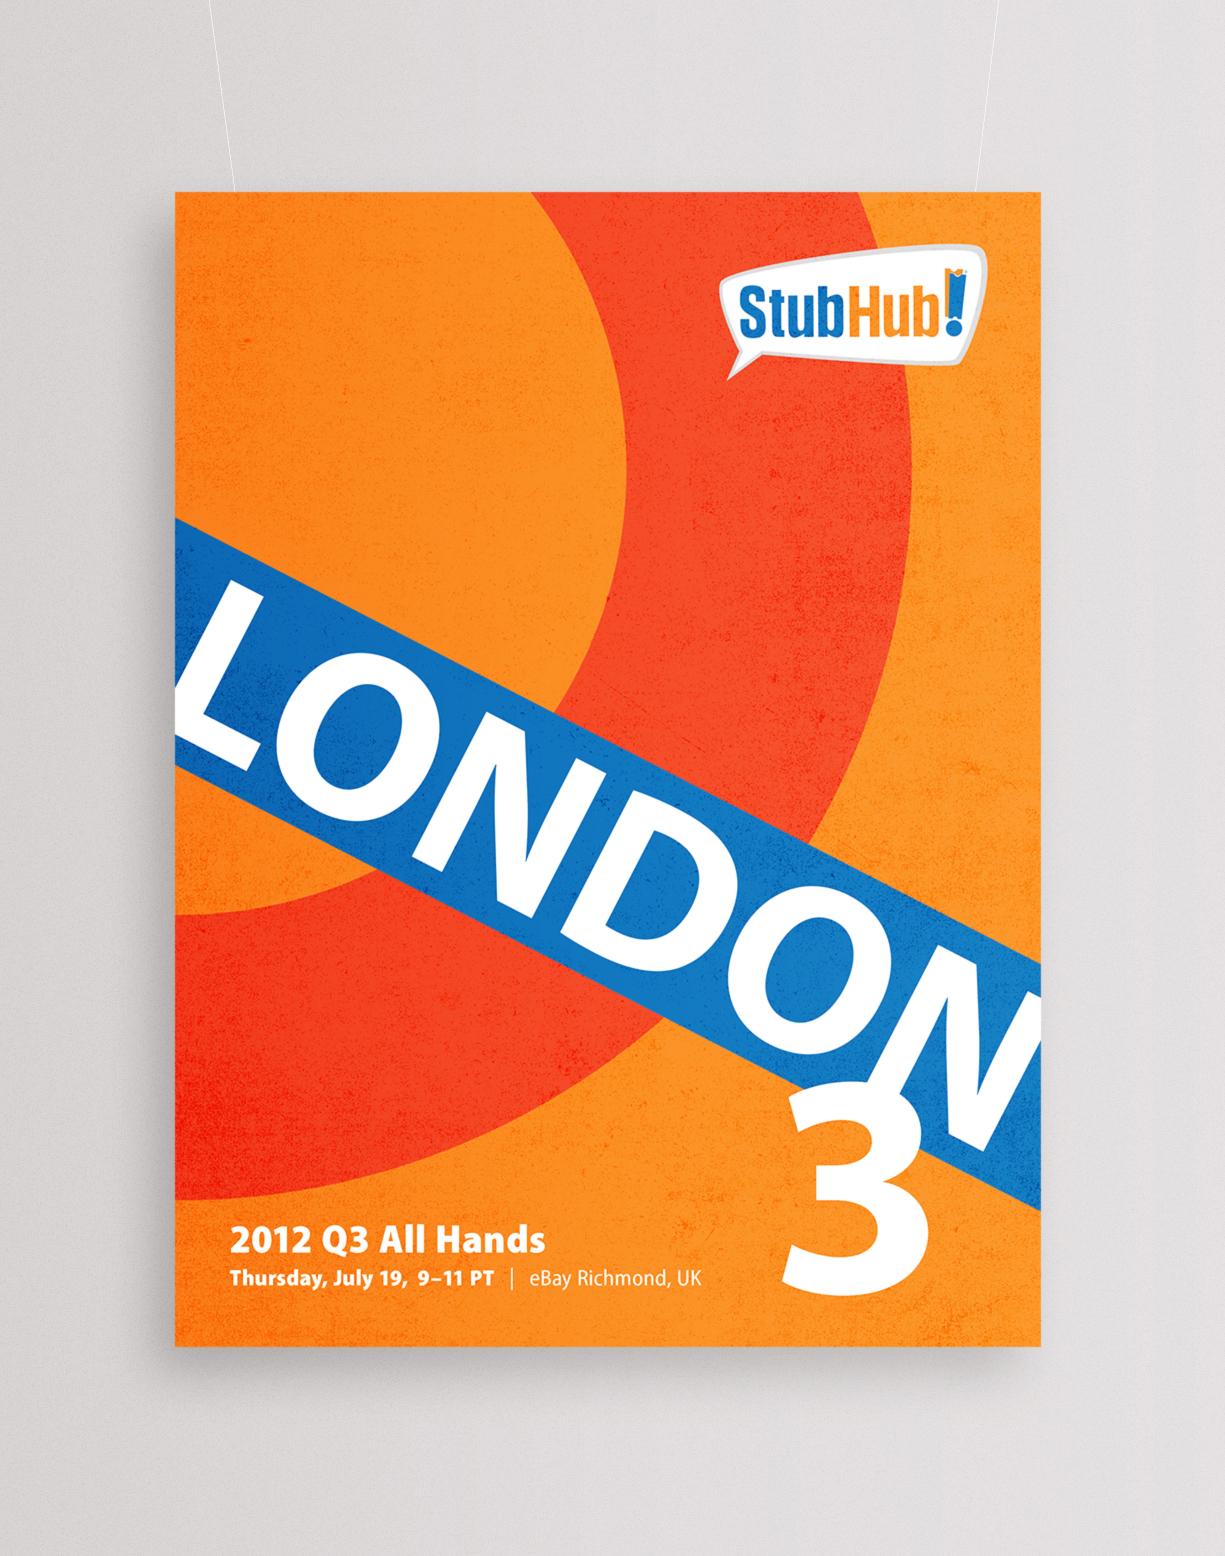 stubhub_2012-Q3_Poster.jpg